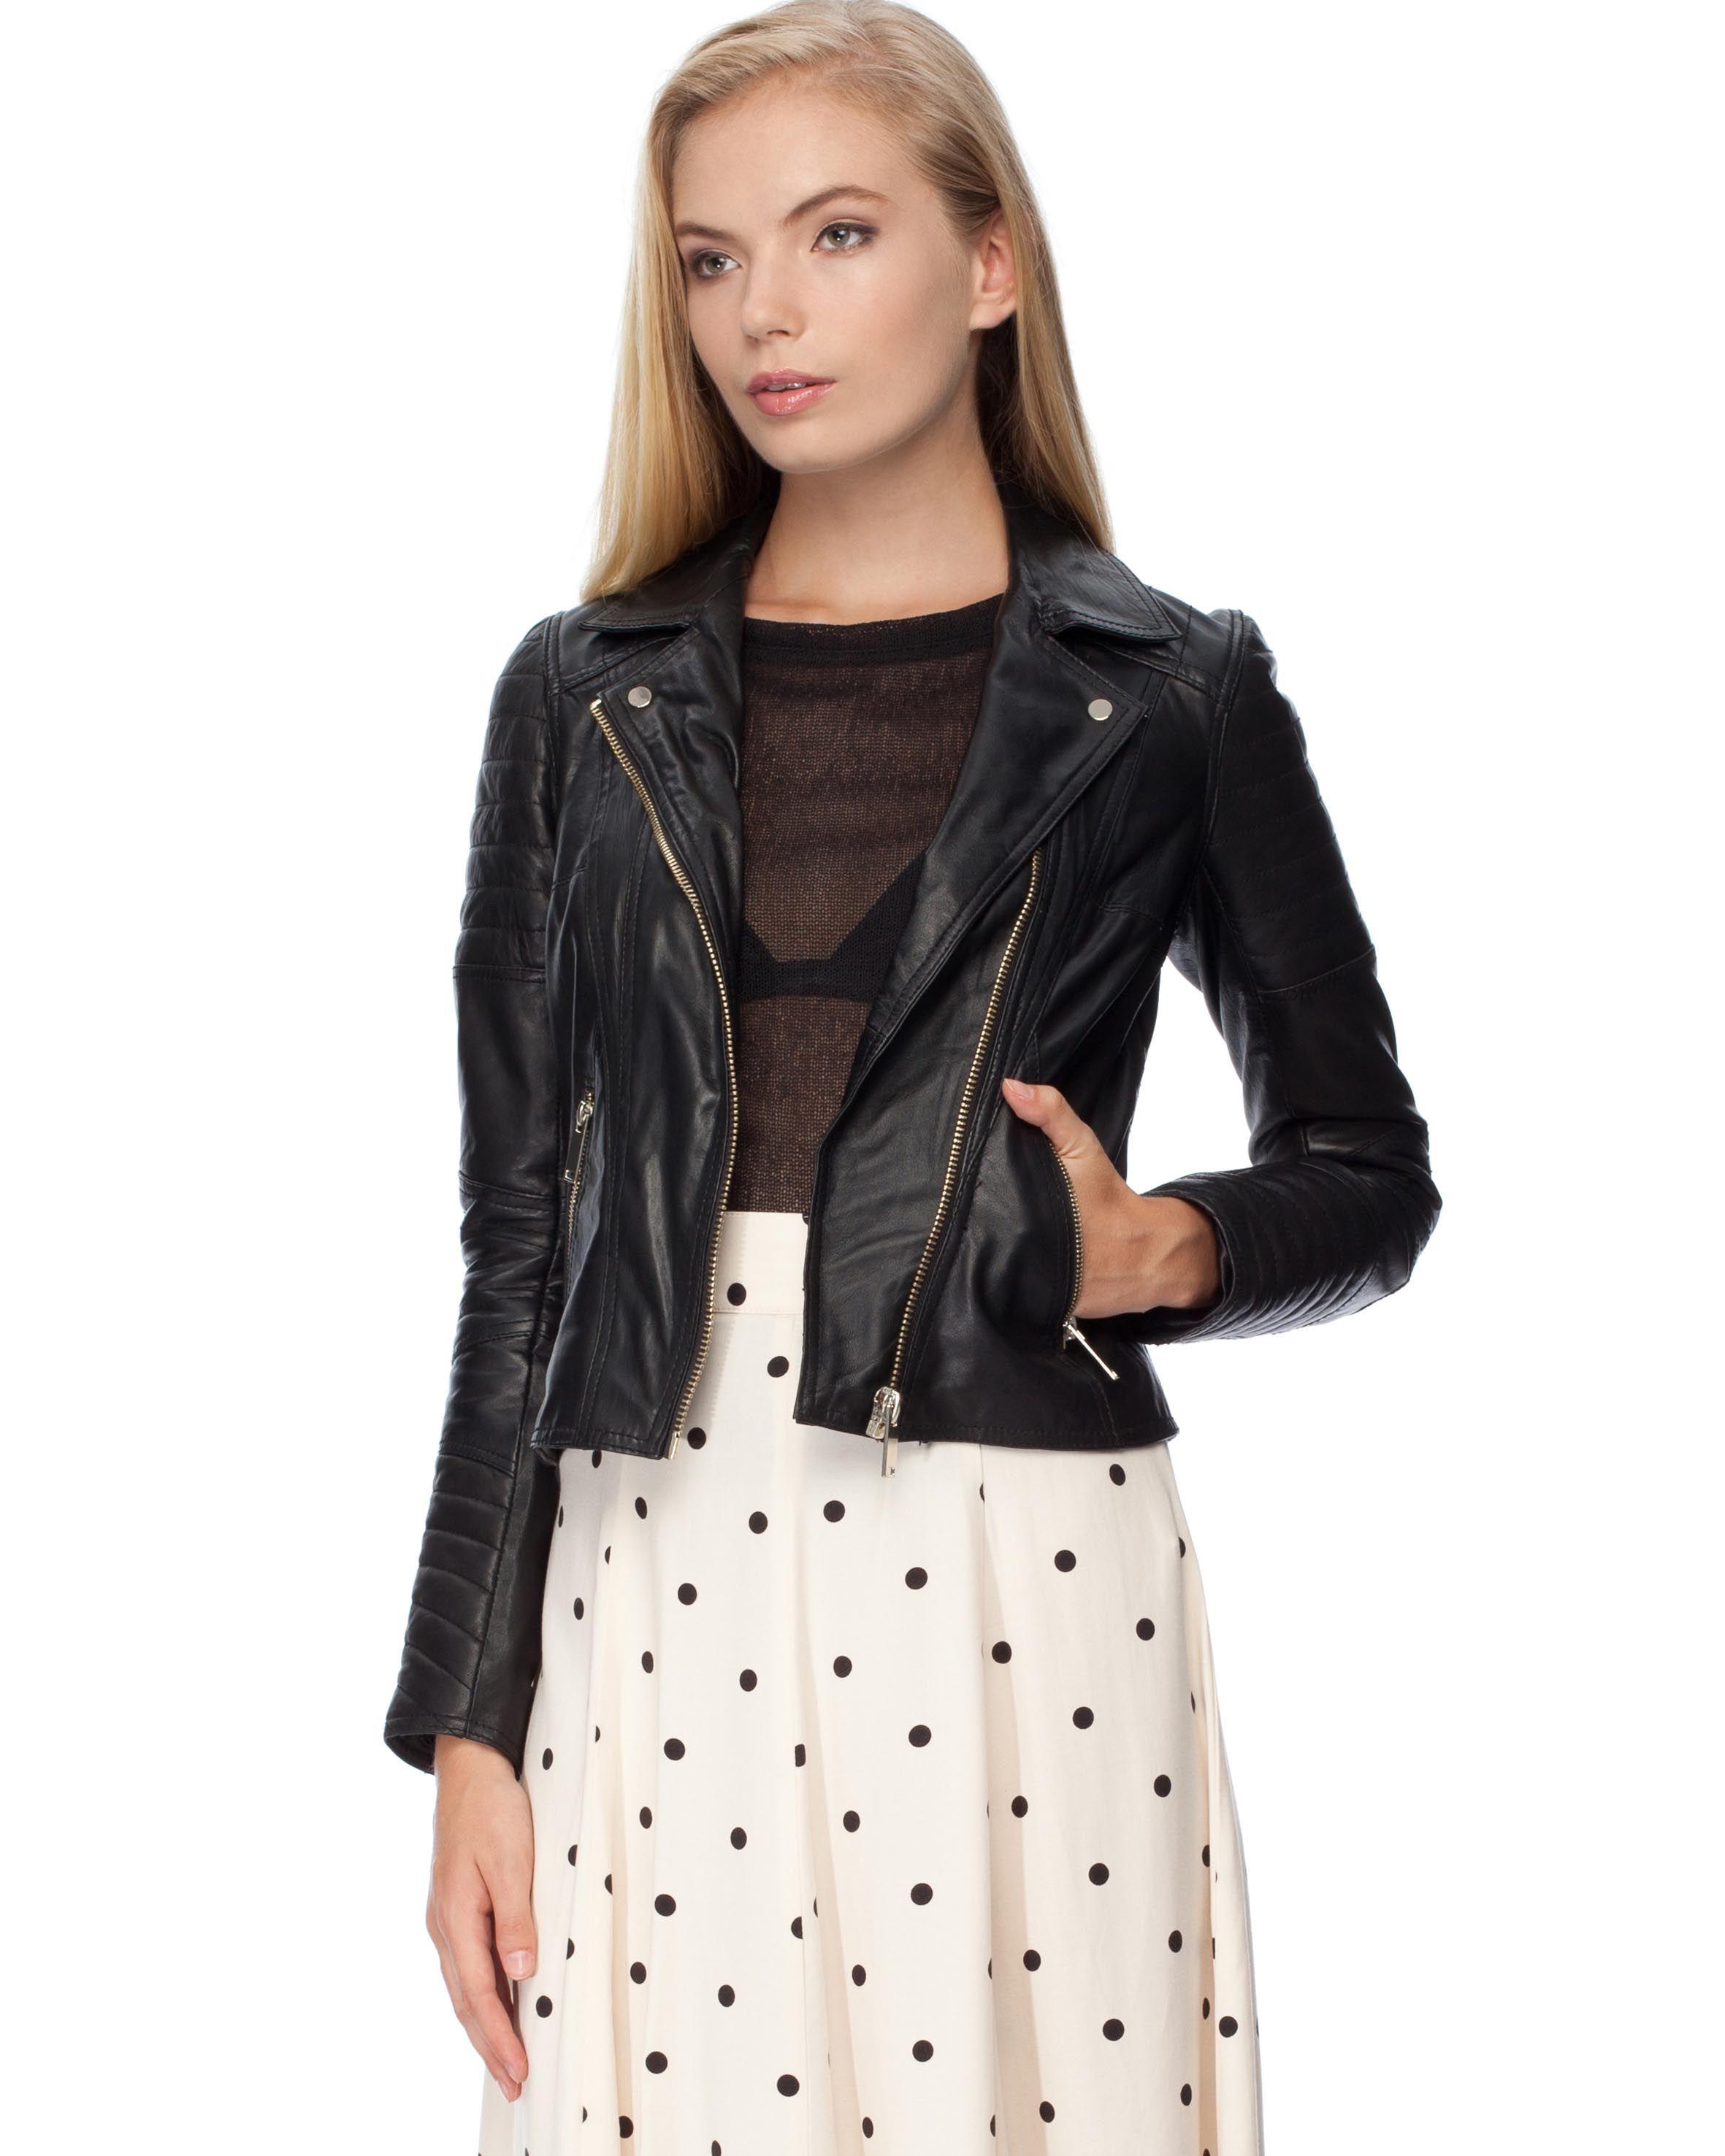 Leather jacket online australia - Leather Bradie Biker Jacket By River Island Online The Iconic Australia